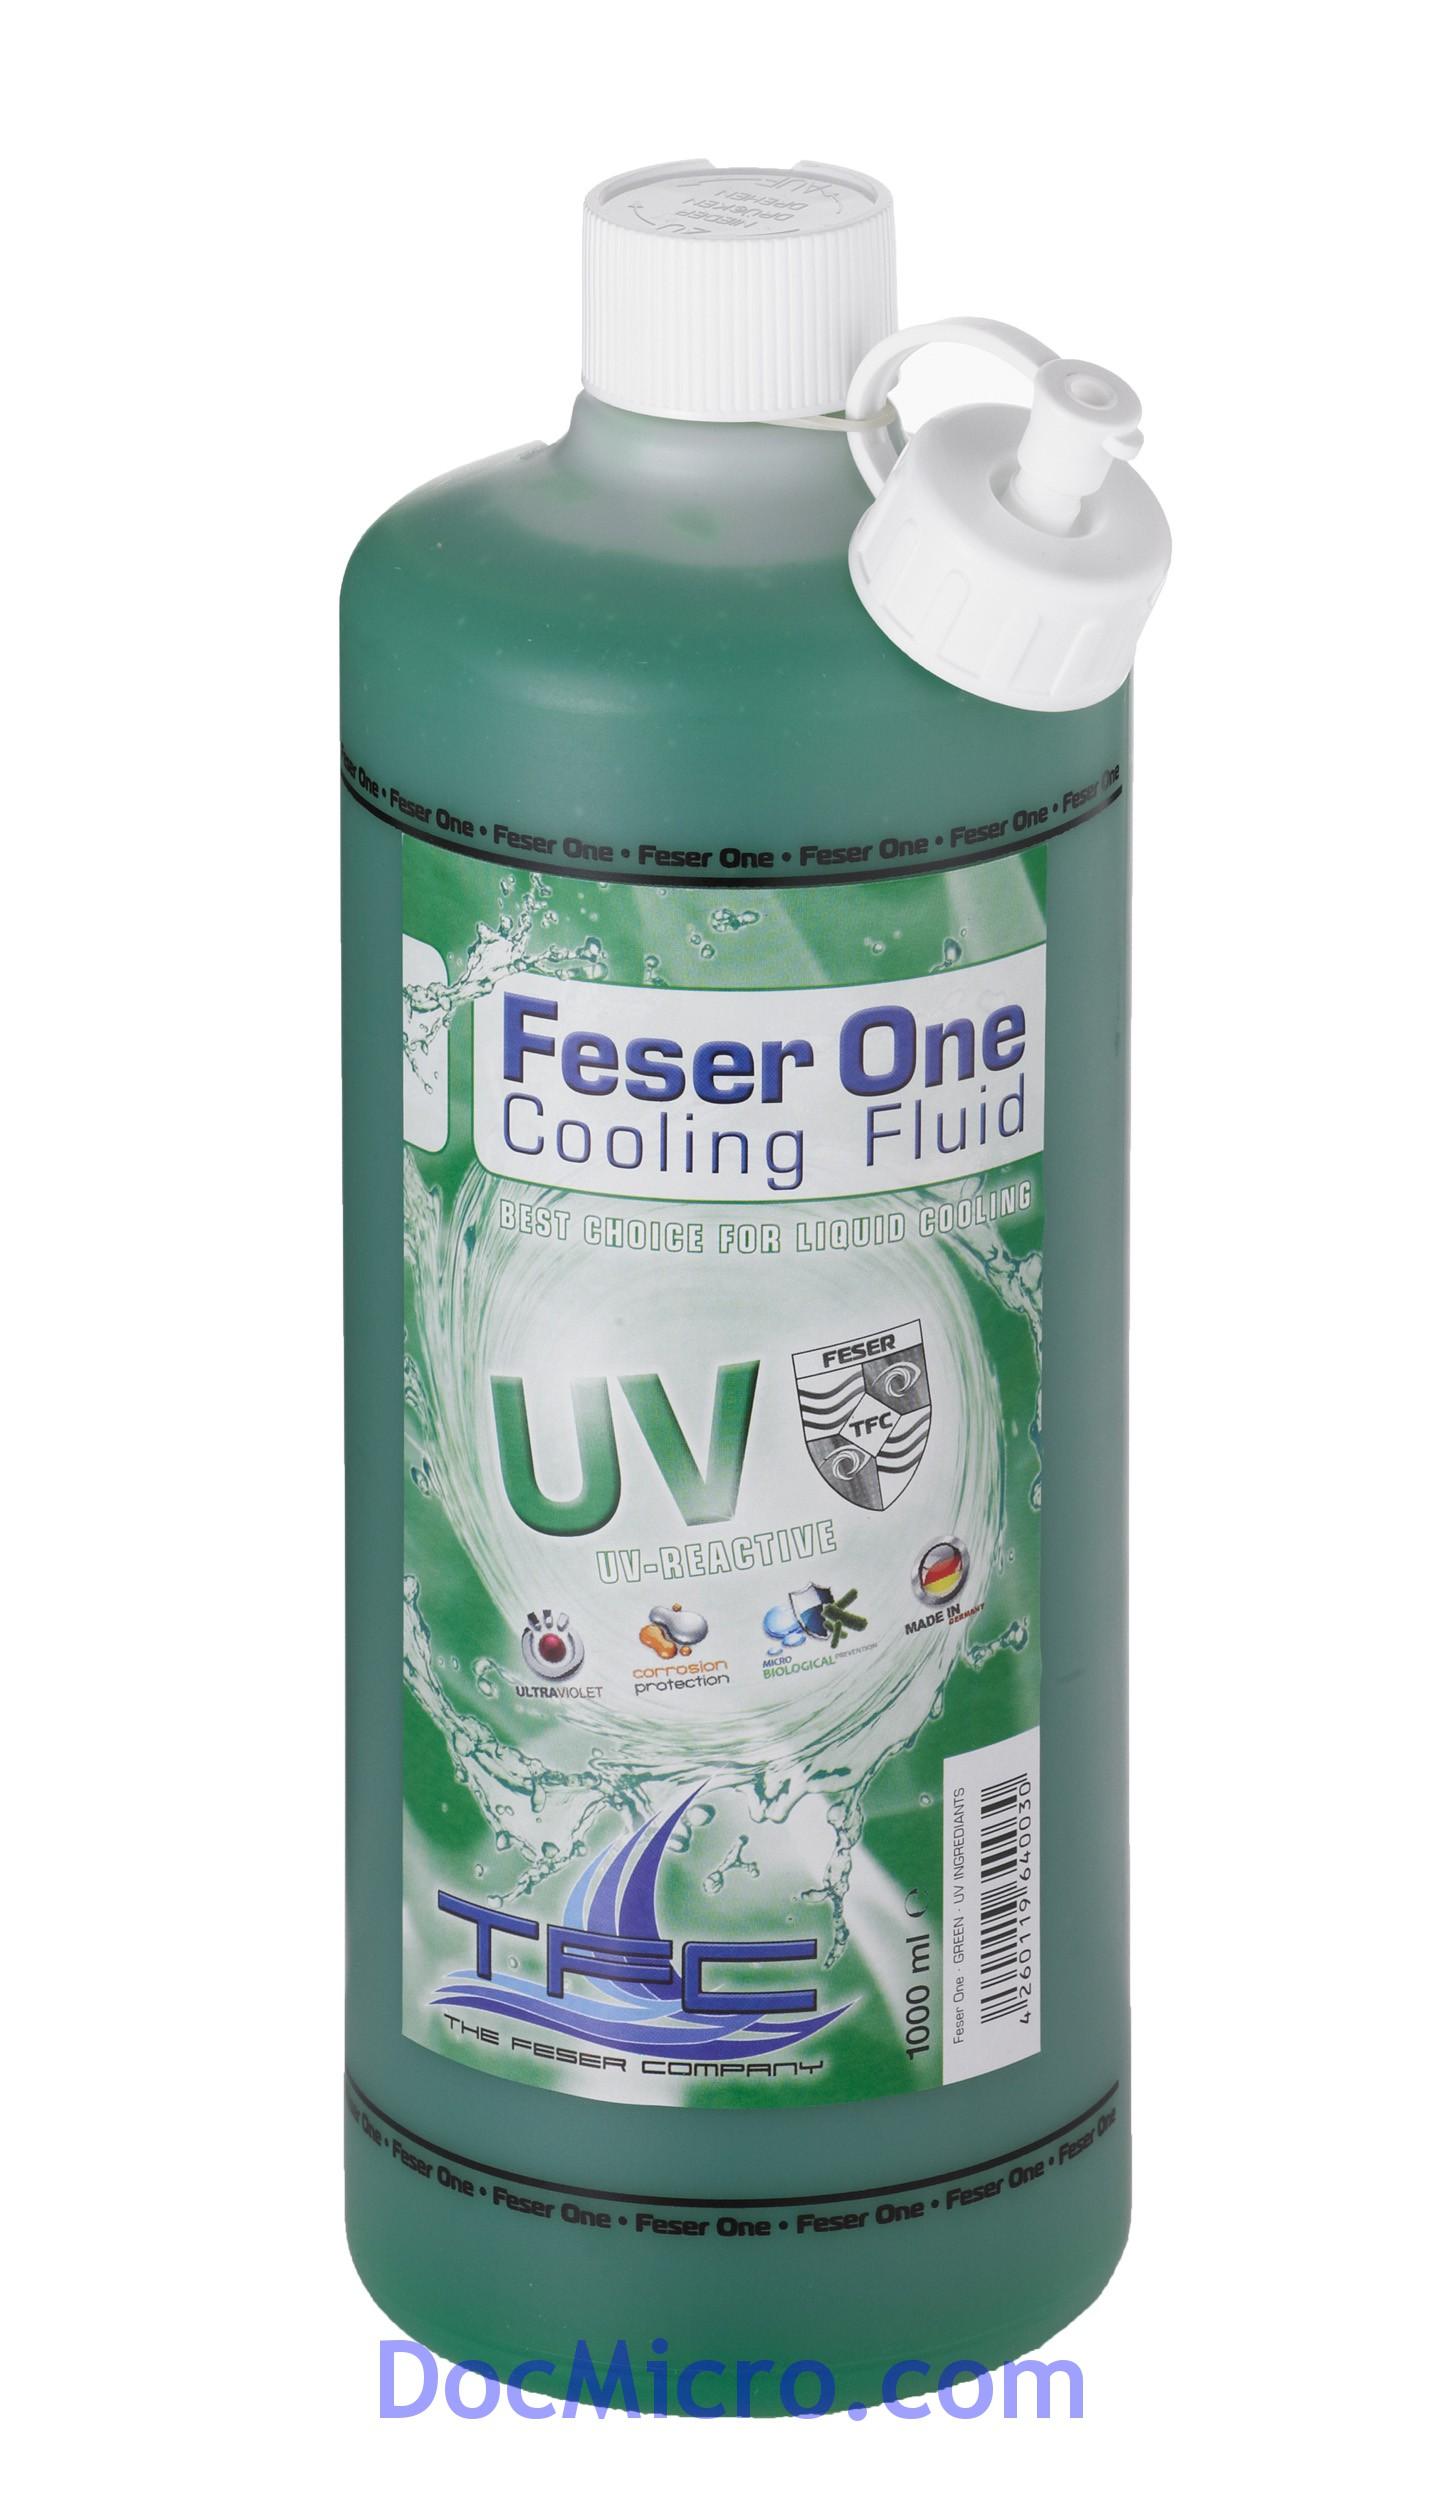 liquide de protection feser one cooling fluid r actif aux uv vert 1 litre the feser company. Black Bedroom Furniture Sets. Home Design Ideas